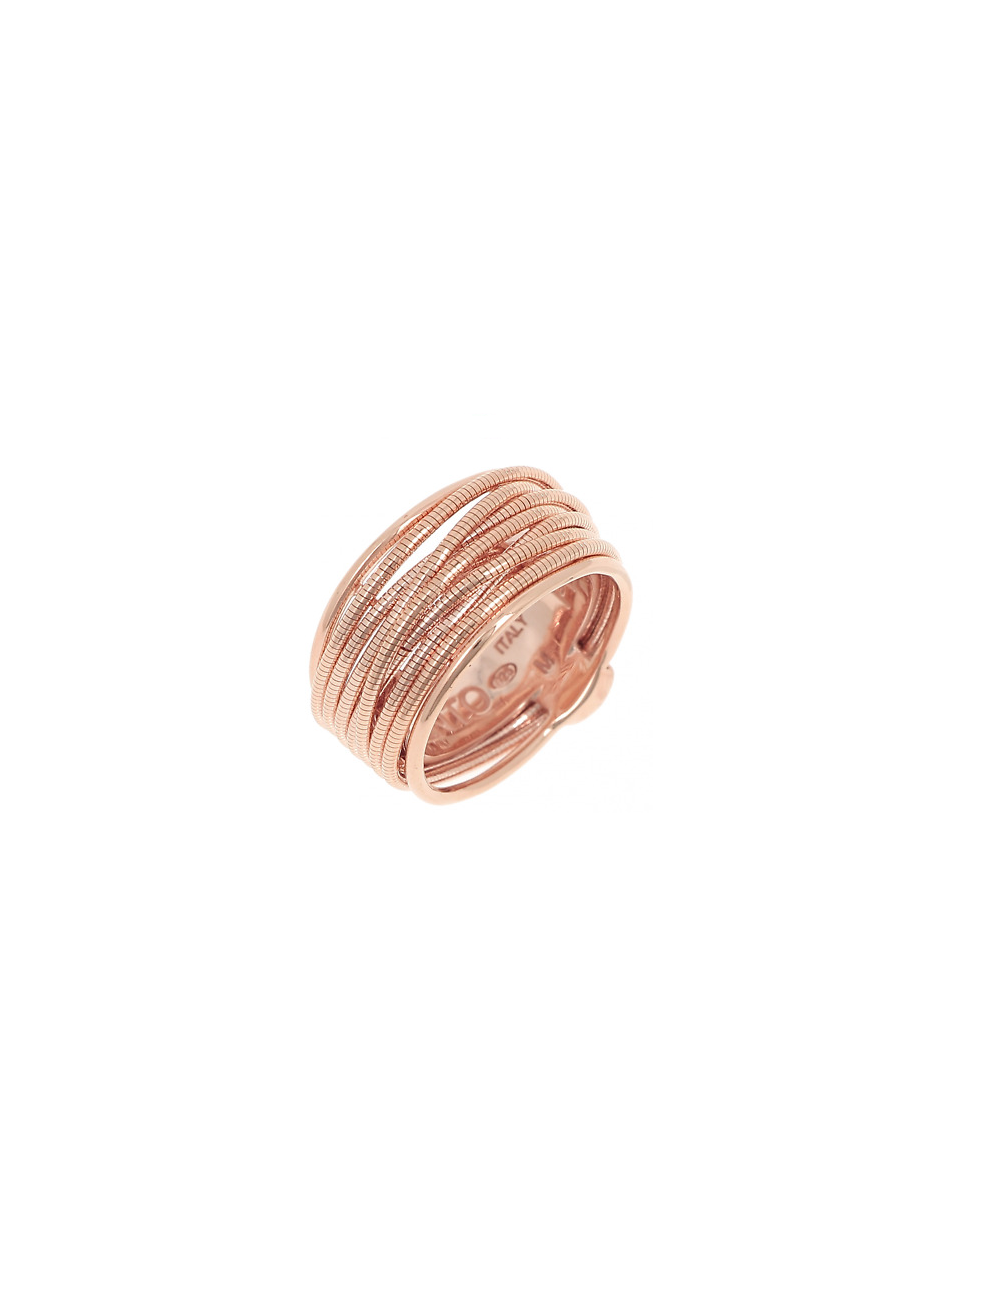 Pesavento -Anillo Pesavento Plata Rosa -WDNAA102